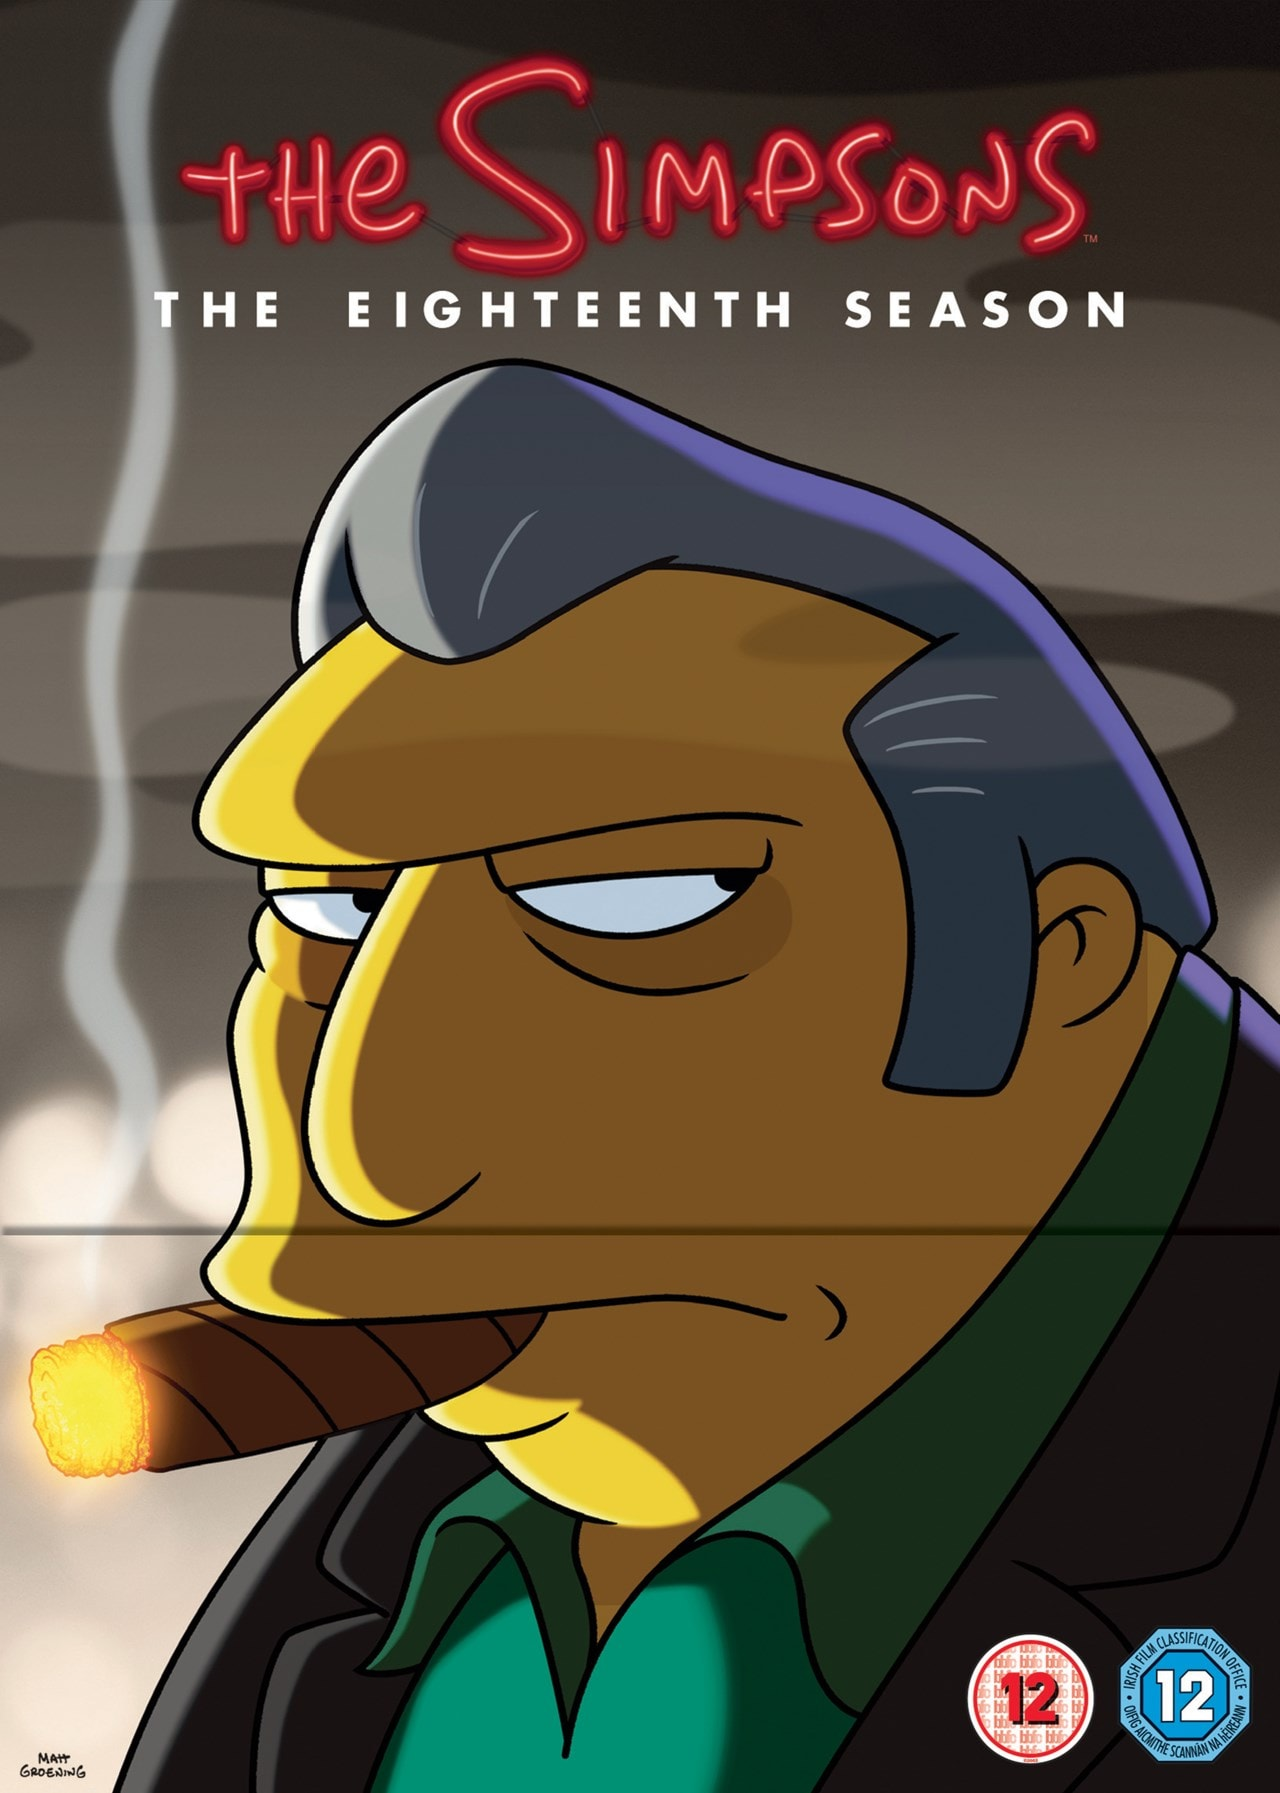 The Simpsons: The Eighteenth Season - 1